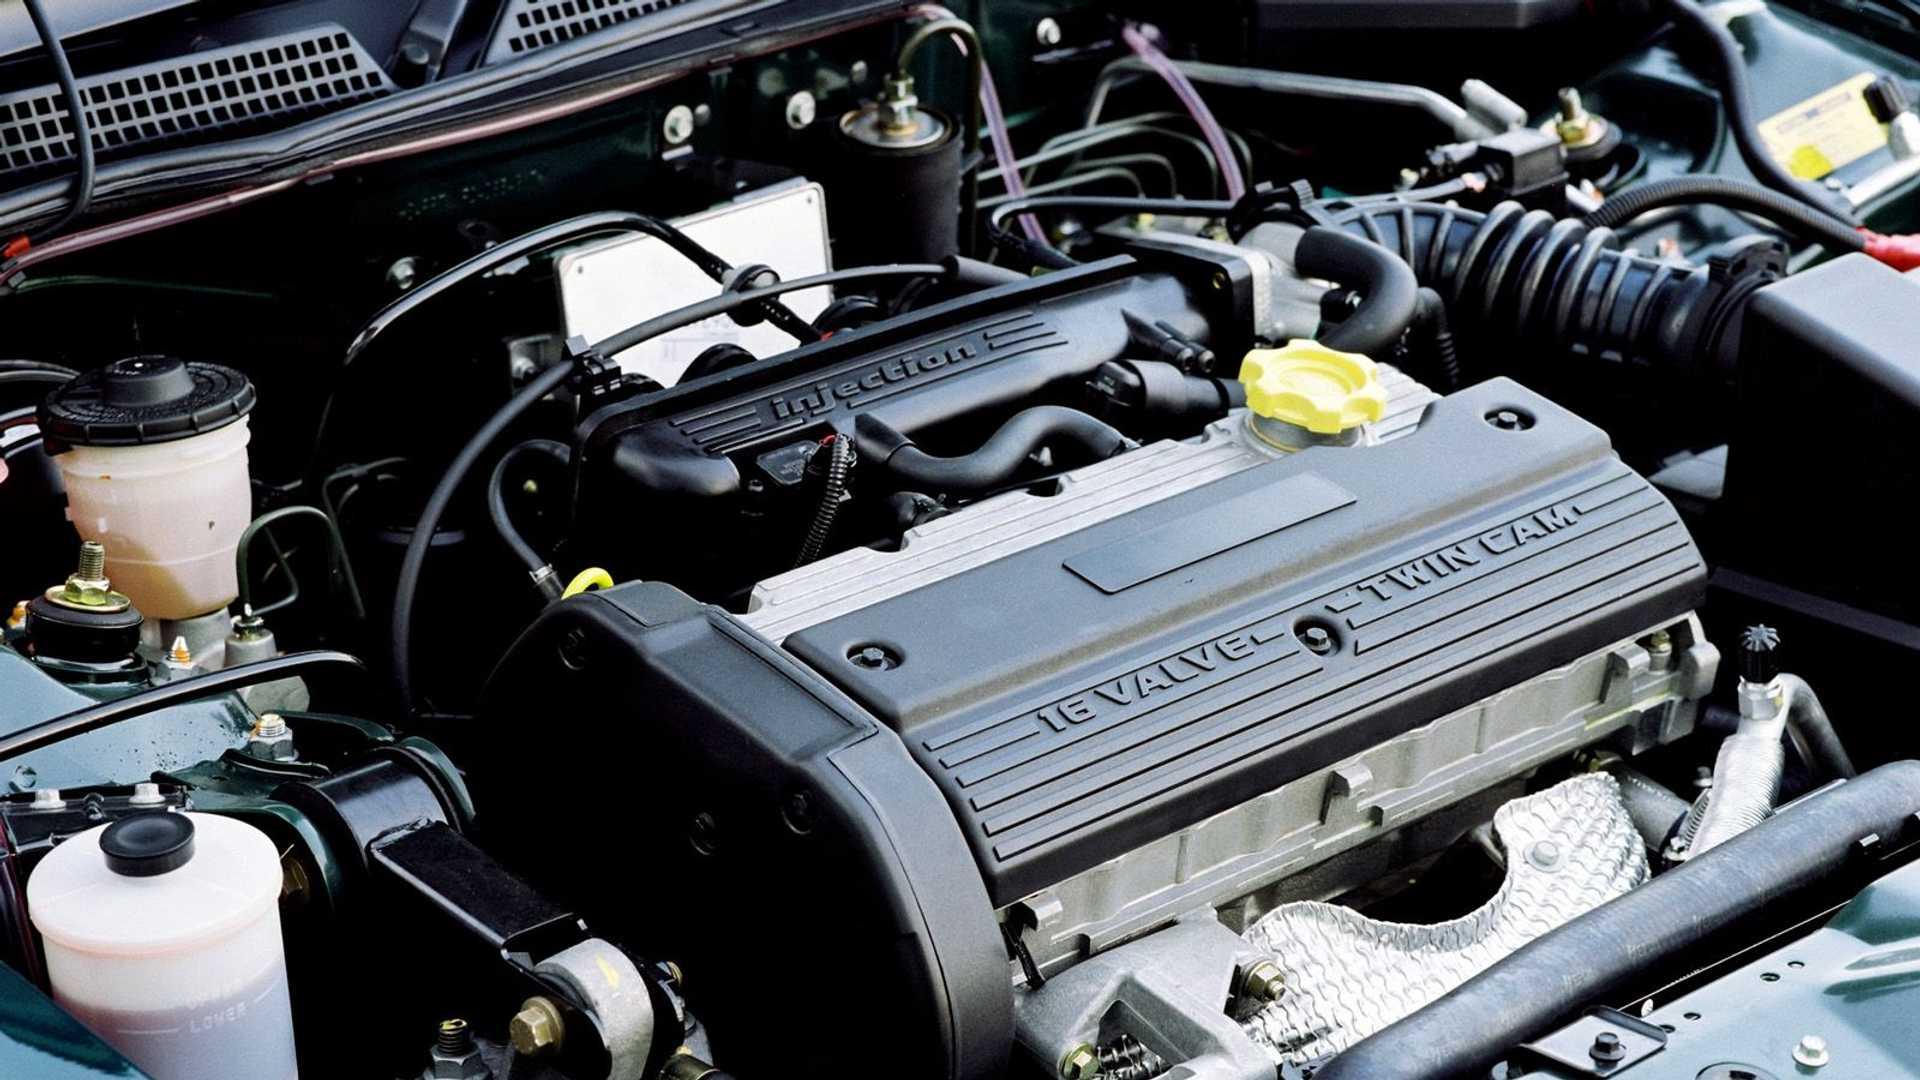 https://cdn.motor1.com/images/mgl/pKoK0/s6/motore-rover-serie-k---mg-zs-120.jpg